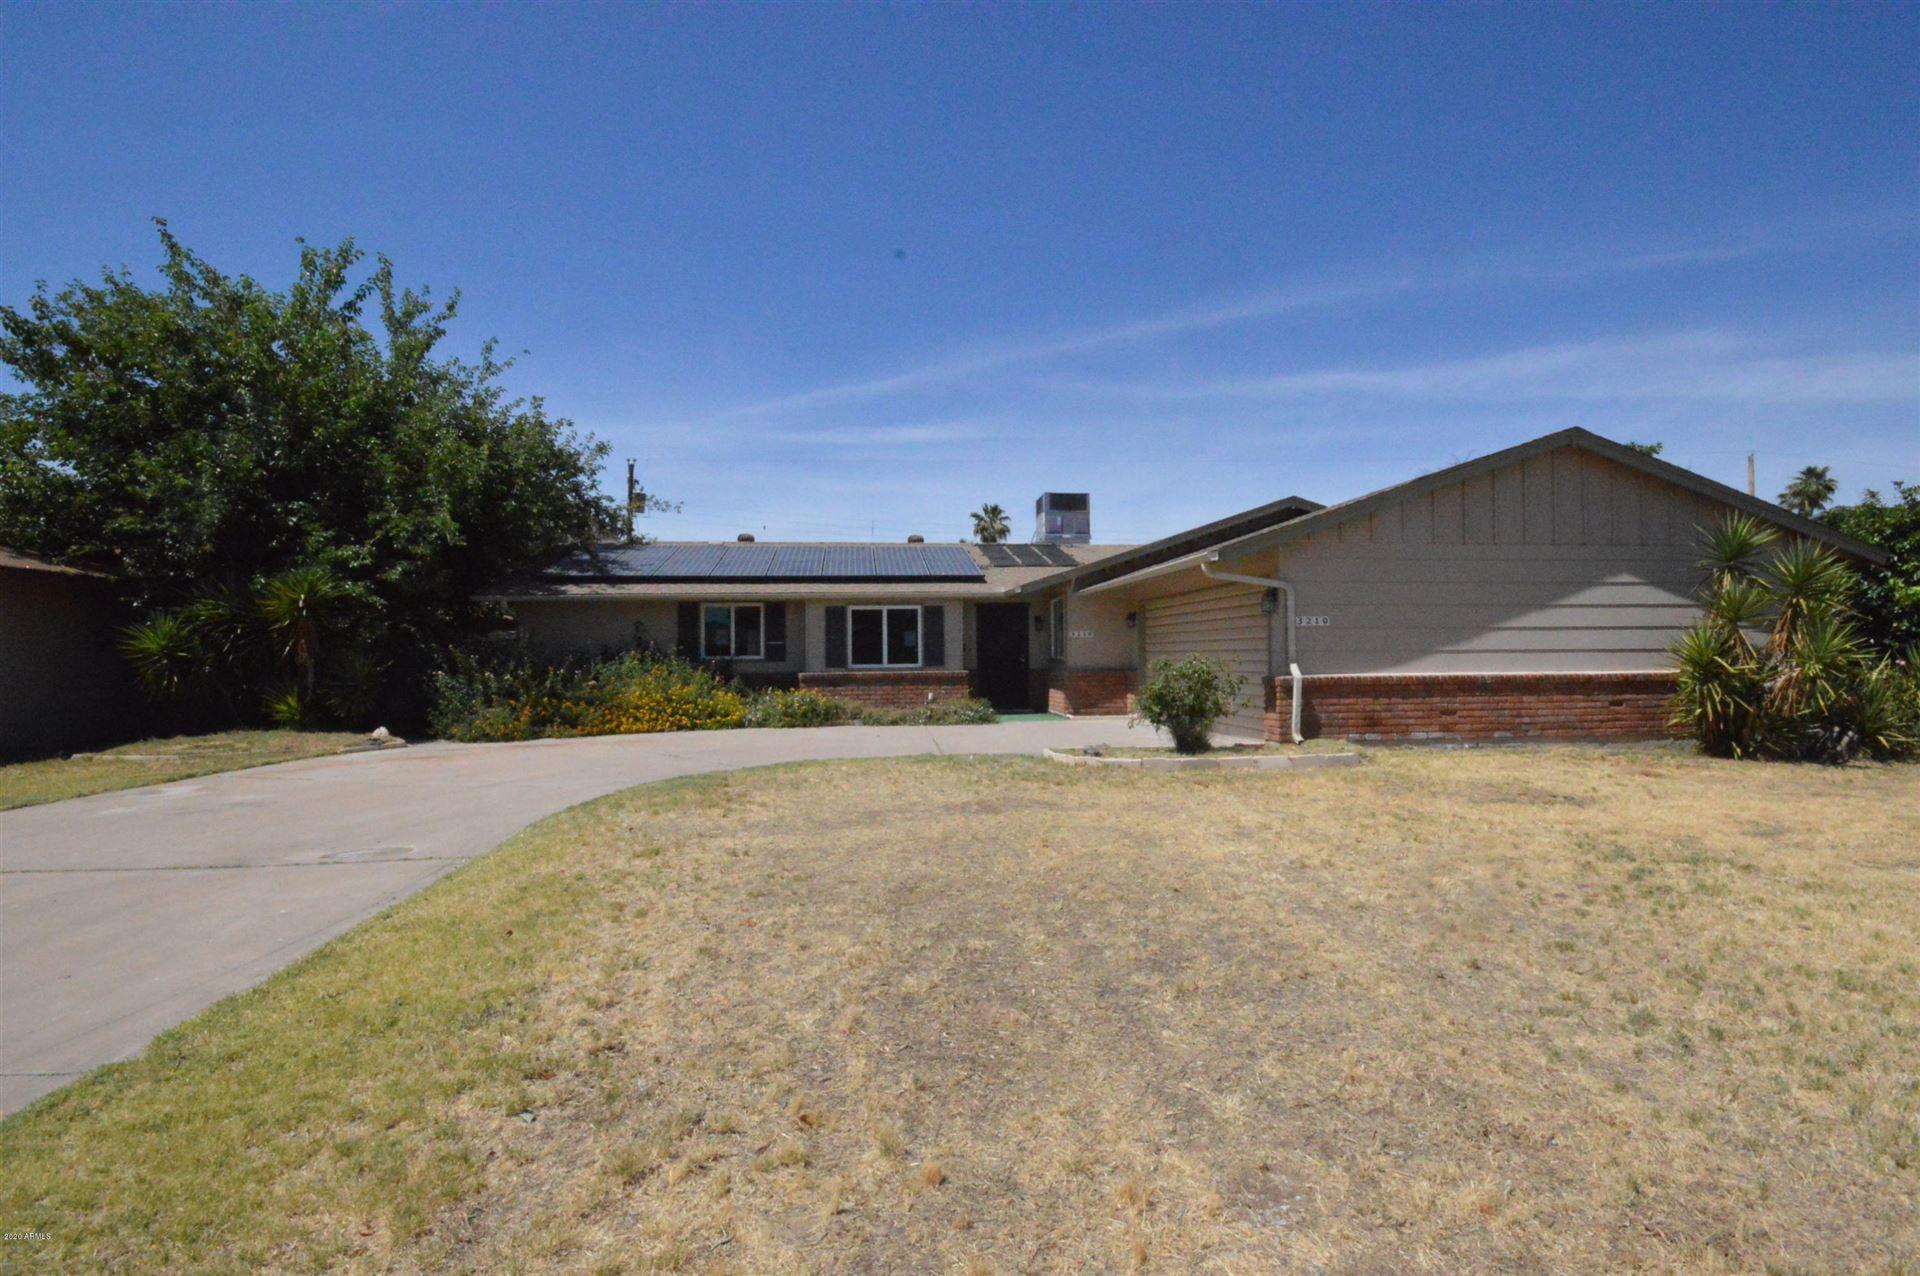 3210 W BELMONT Avenue, Phoenix, AZ 85051 - MLS#: 6082679